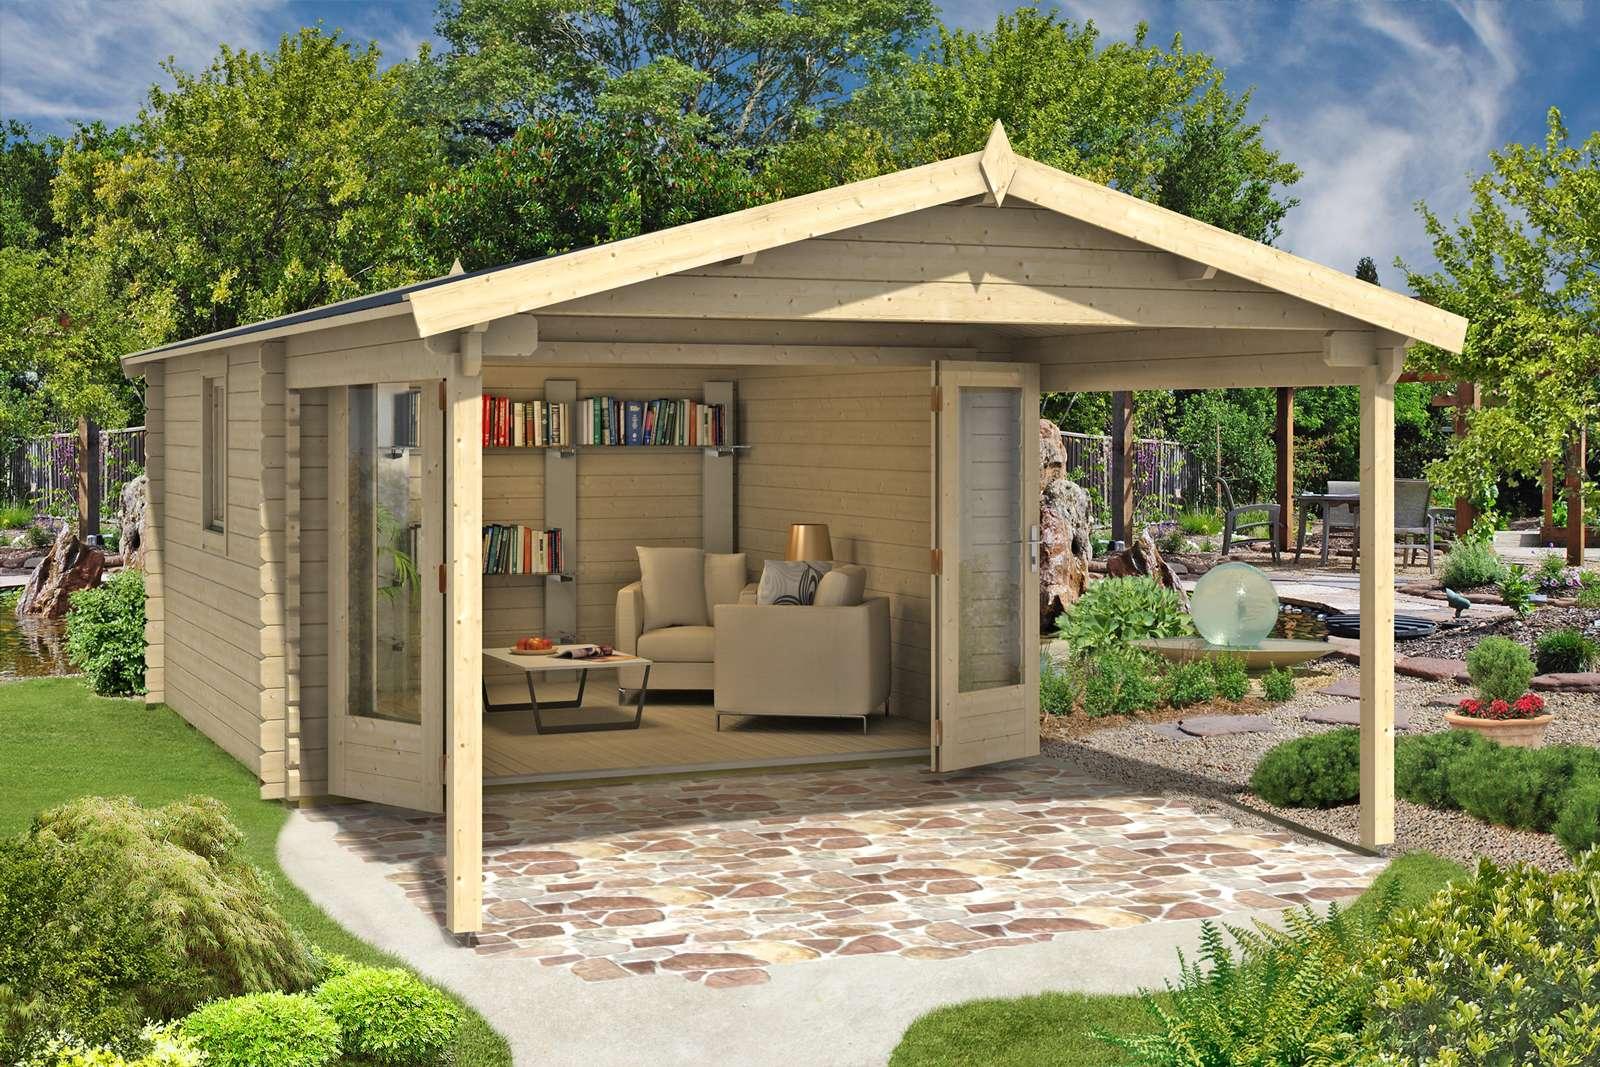 gartenhaus catlitterplus. Black Bedroom Furniture Sets. Home Design Ideas